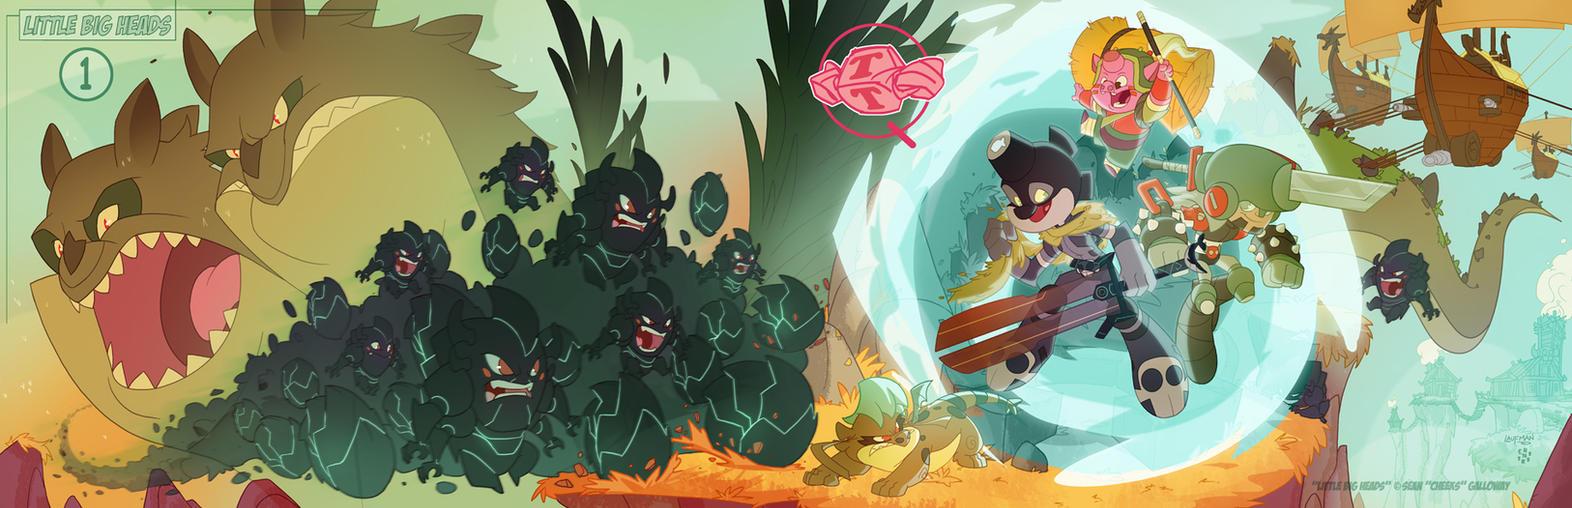 LittleBigHeads Kickstarter promo finished! by cheeks-74